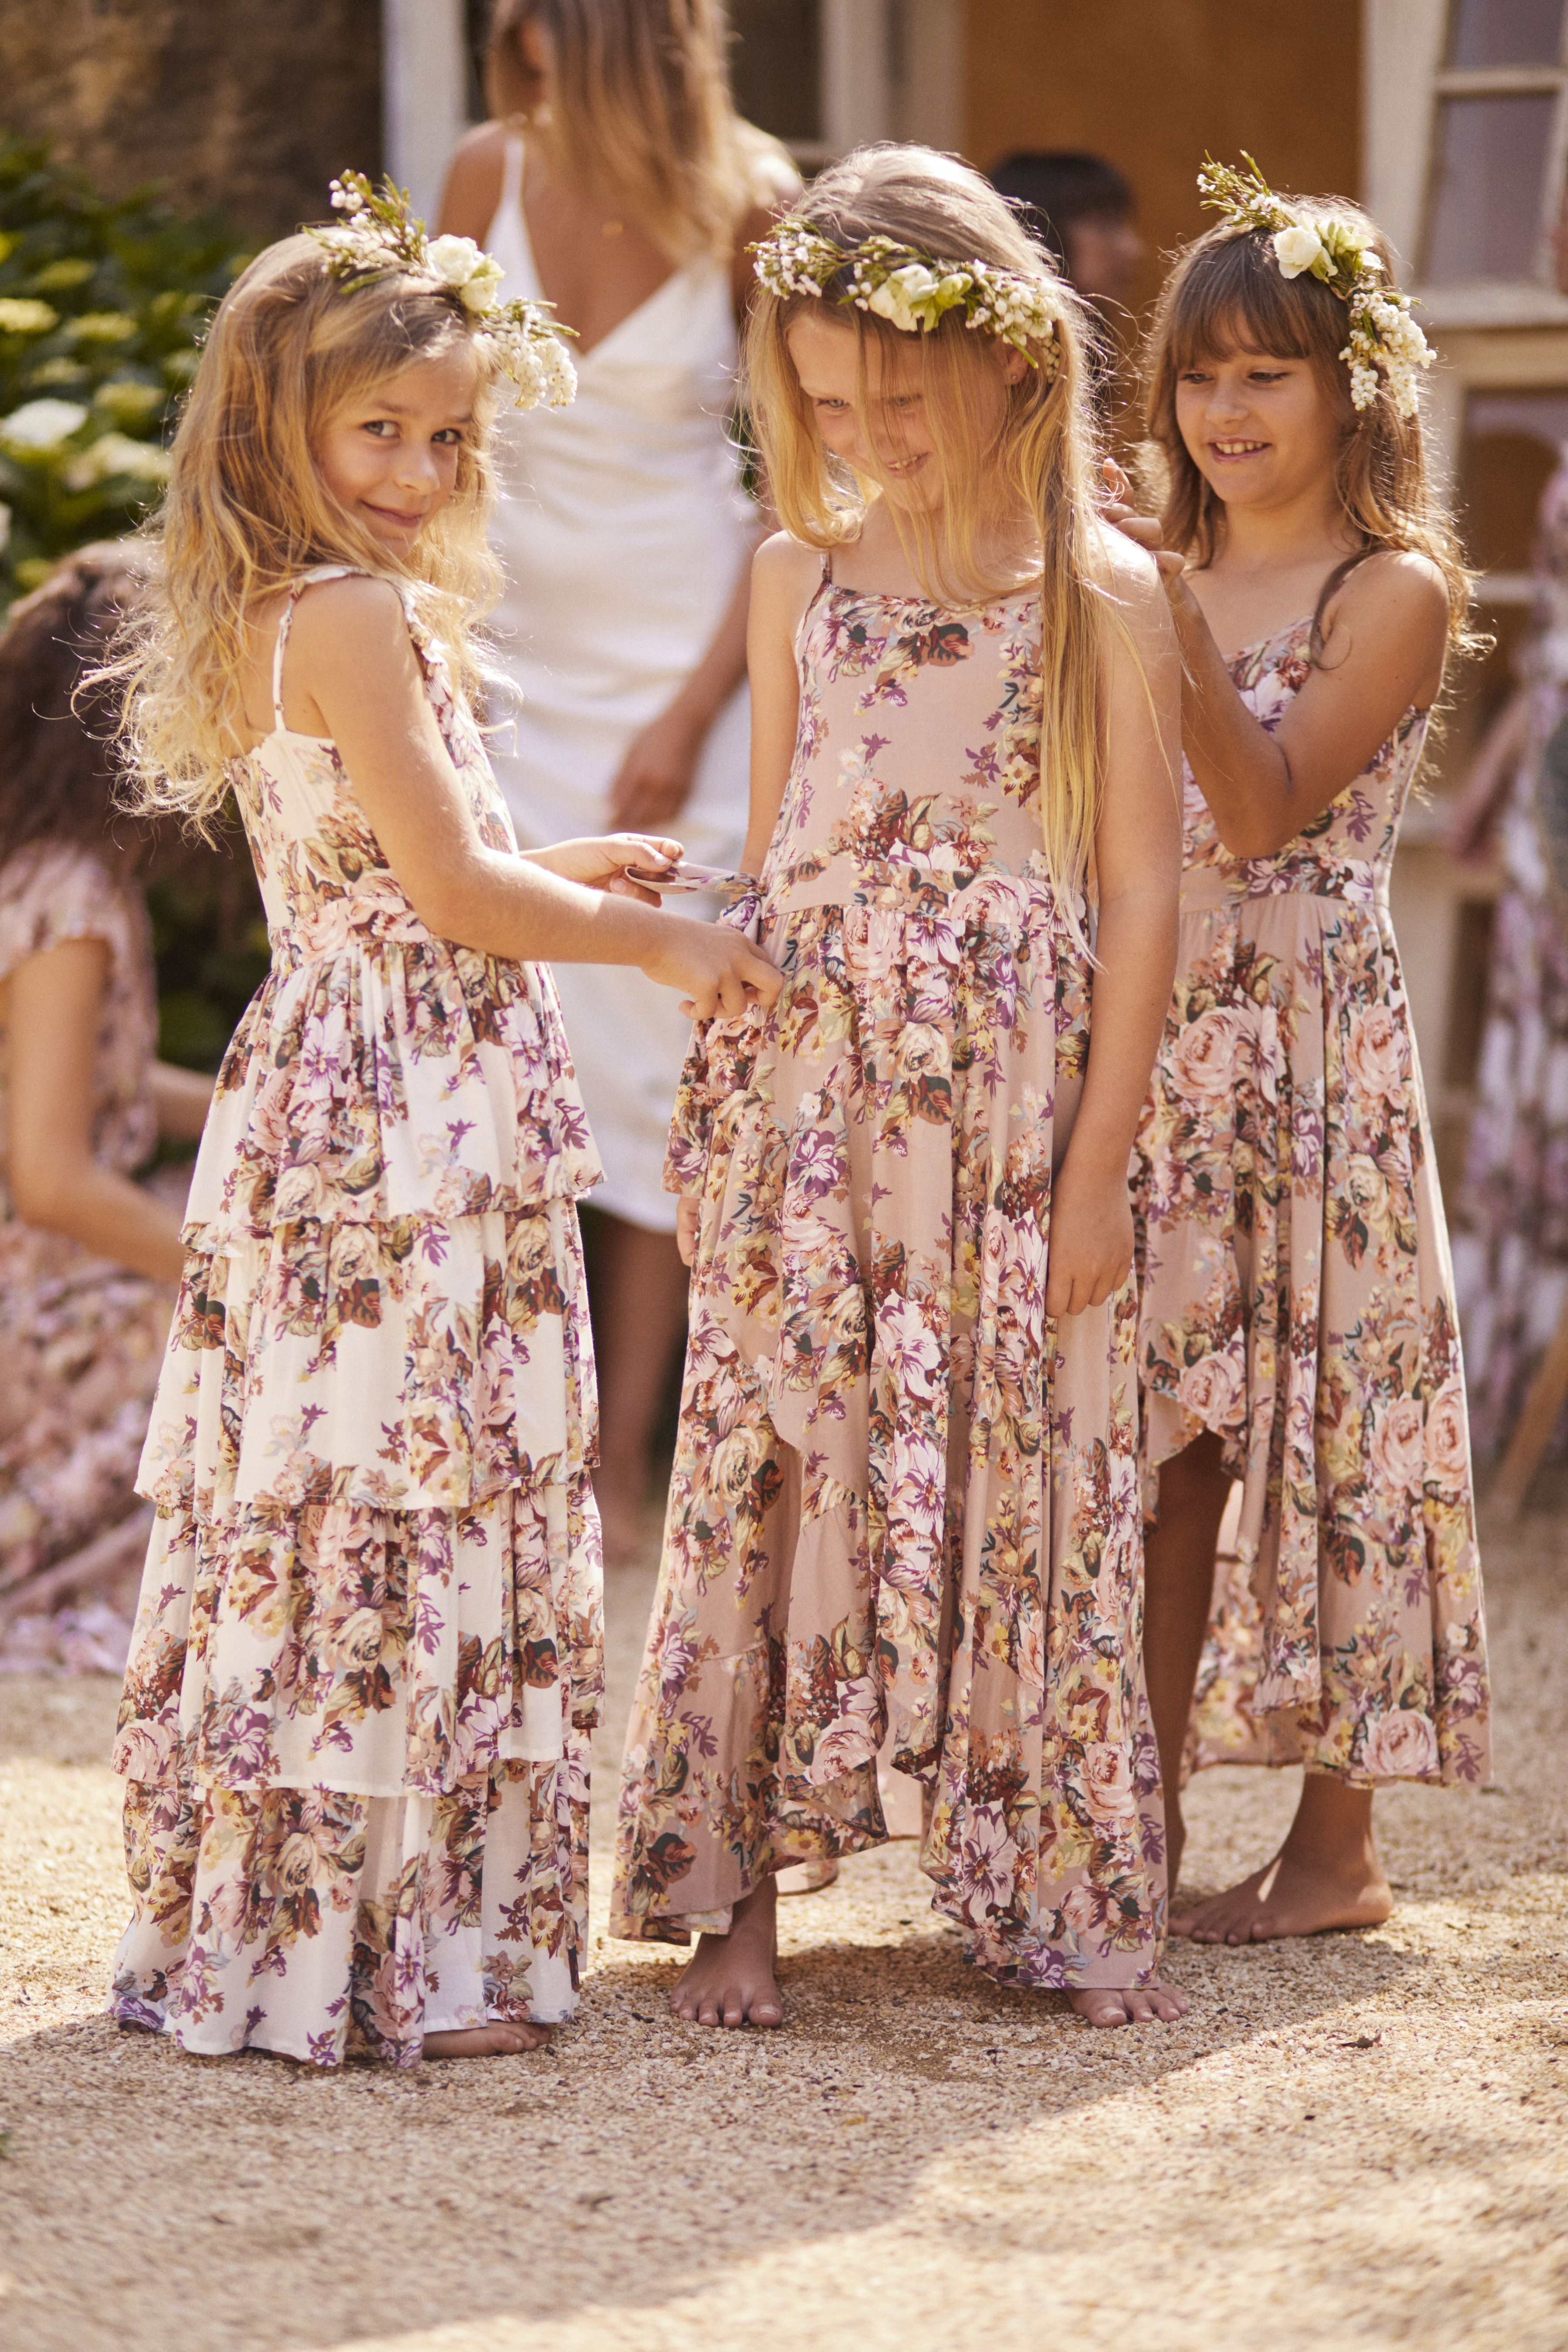 de9226d63f5b Vintage-inspired floral flower girl dresses by Auguste the Label ...